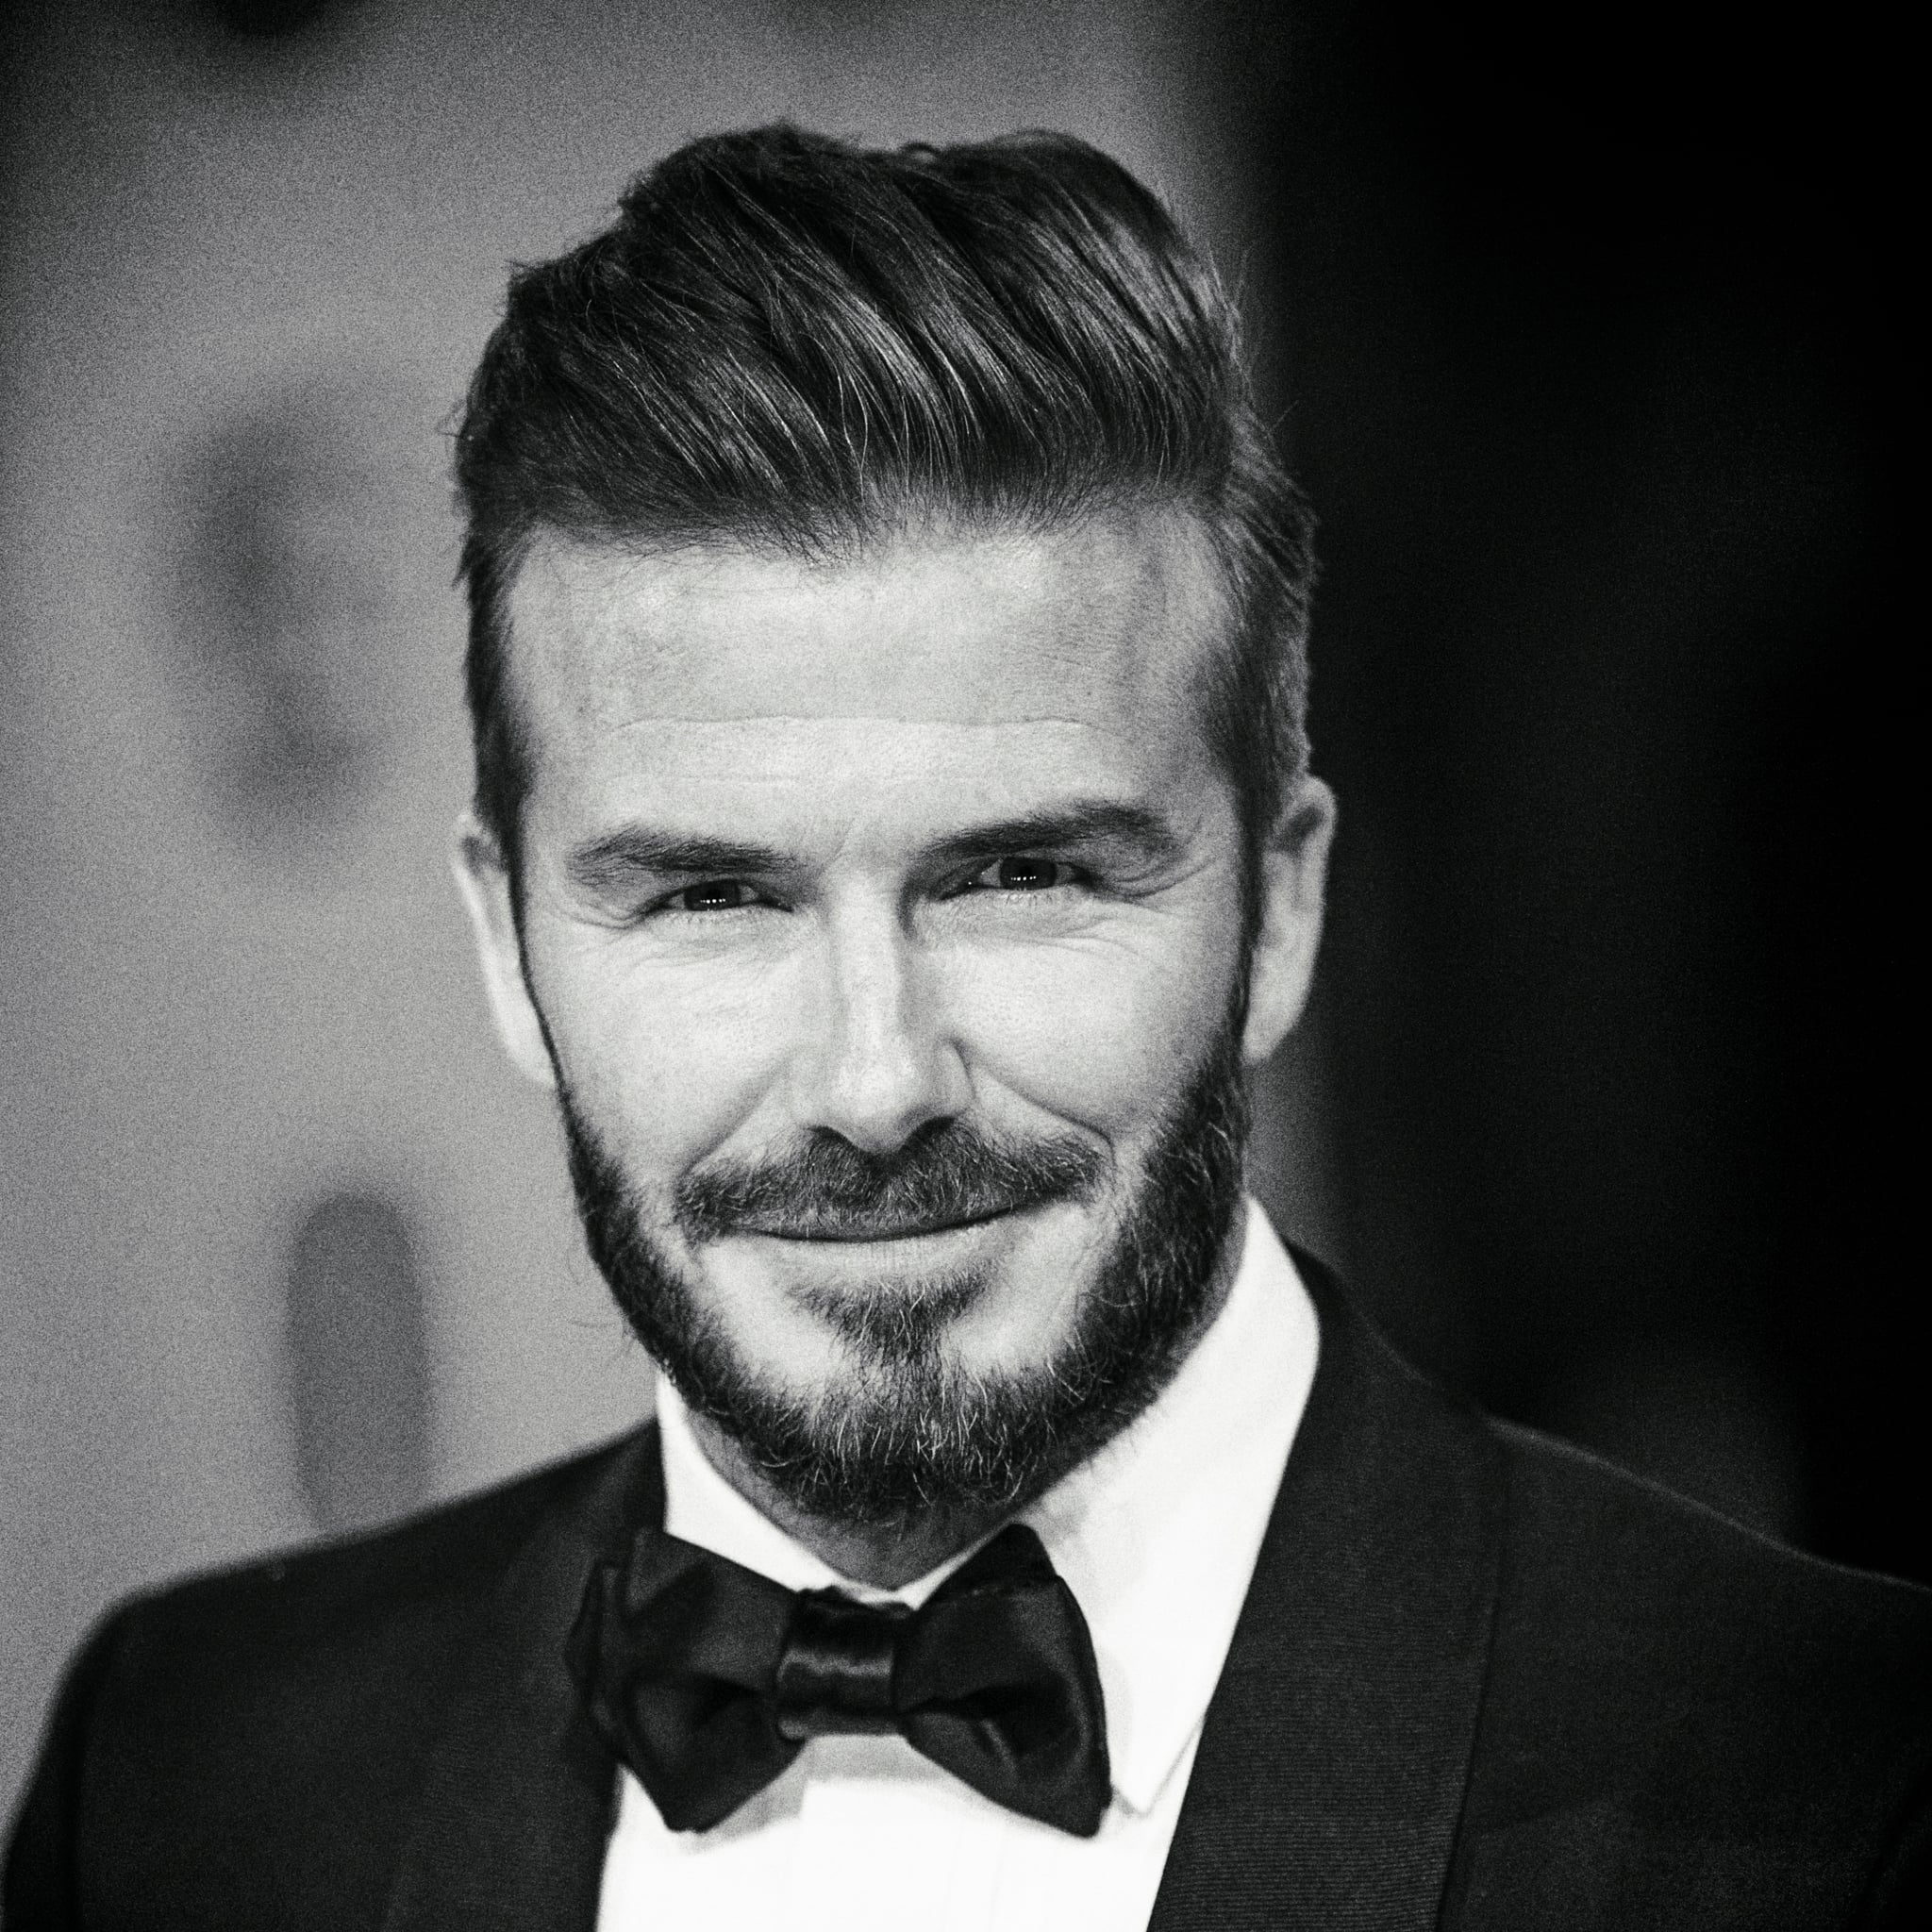 The Most Gorgeous Photos Of David Beckham POPSUGAR Celebrity UK - David beckham hairstyle back view 2015